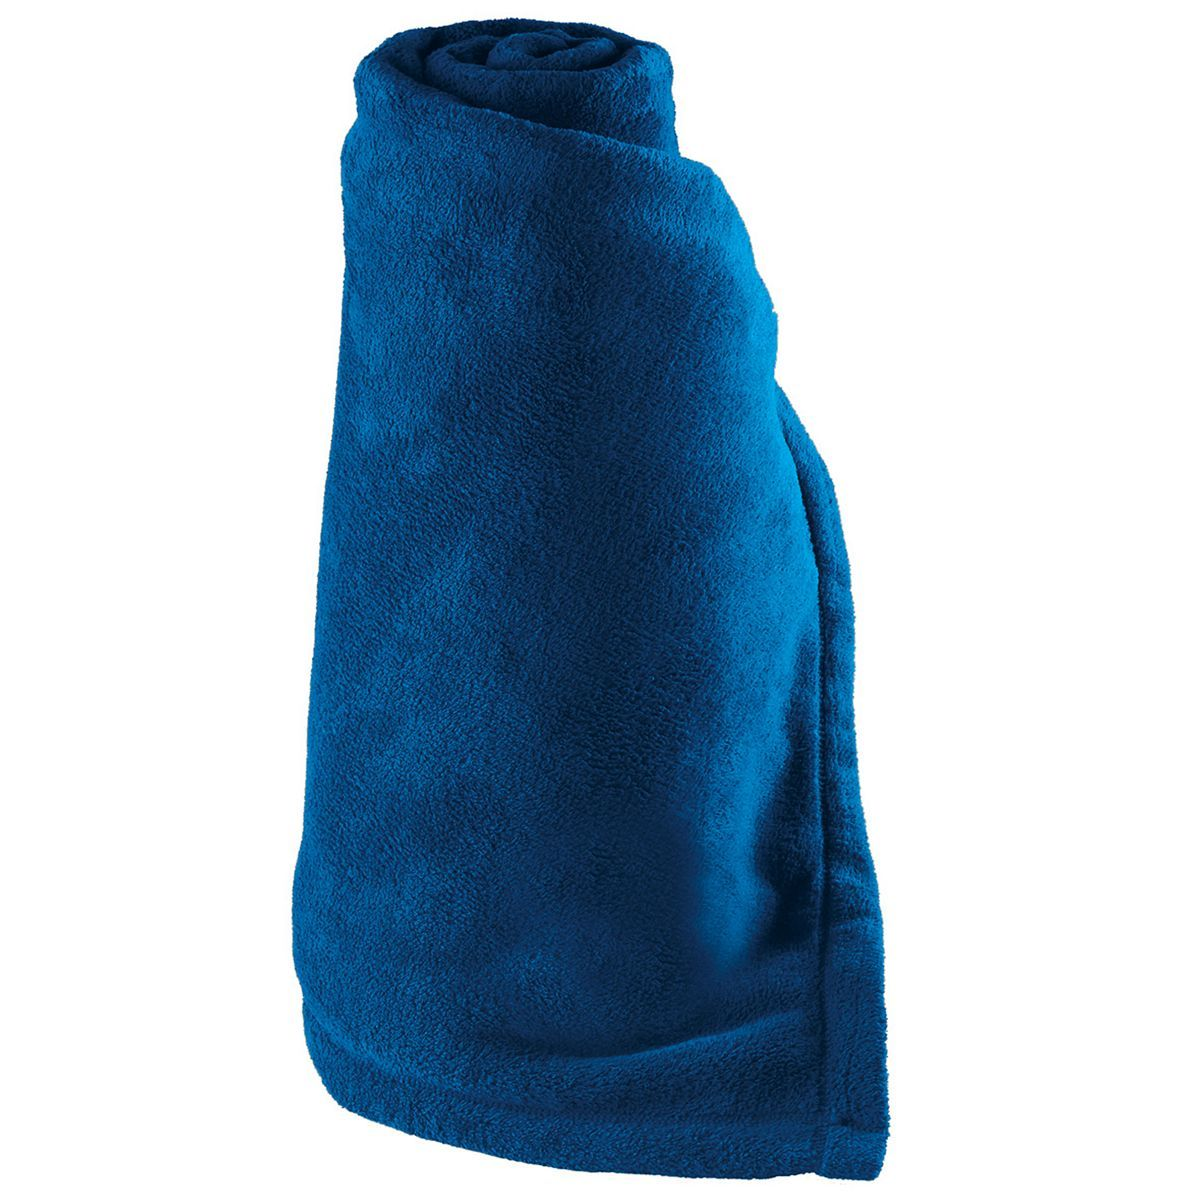 Tailgate Blanket - ROYAL